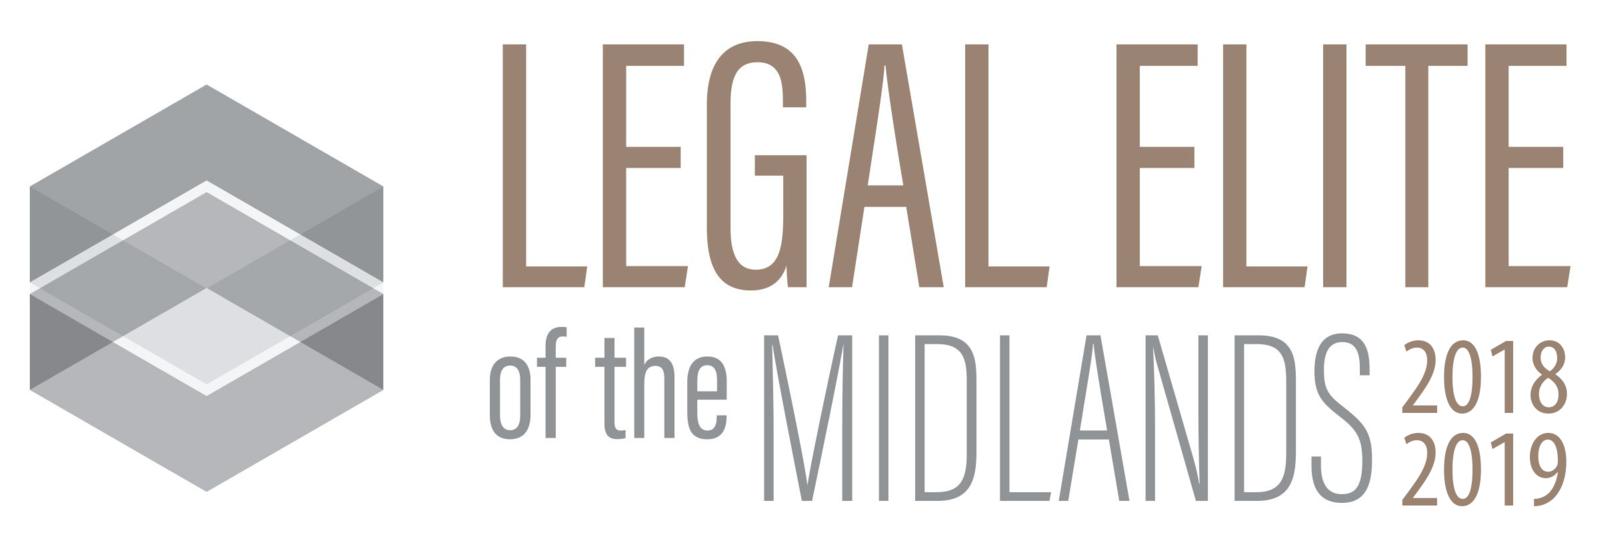 2018 2019 Legal Elite of the Midlands